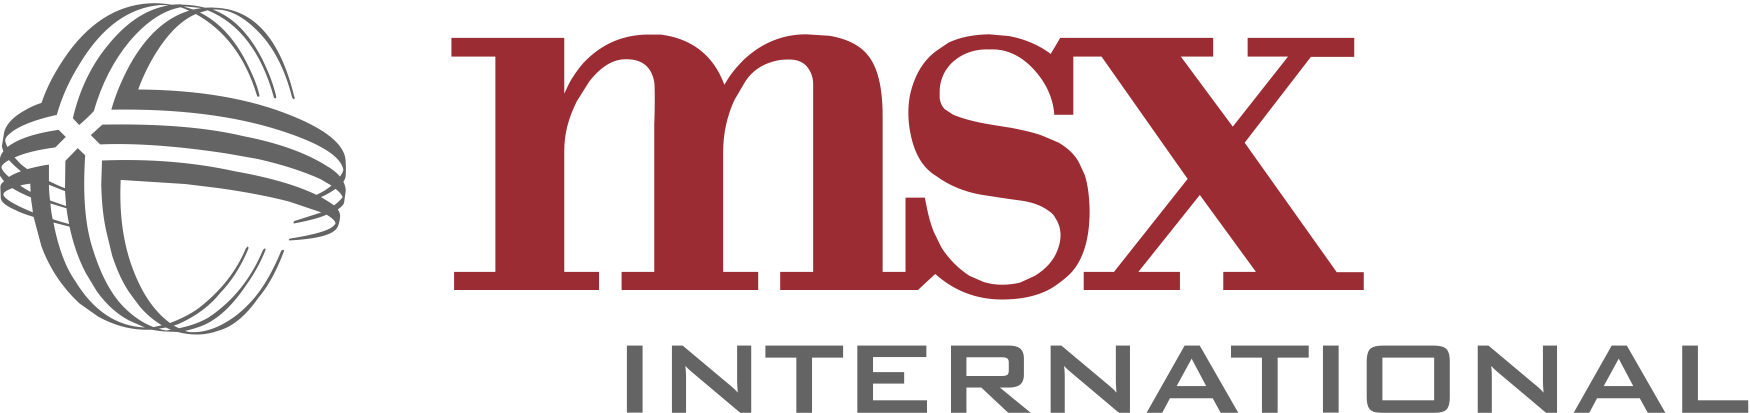 msxi_Logo_2c_JPEG version